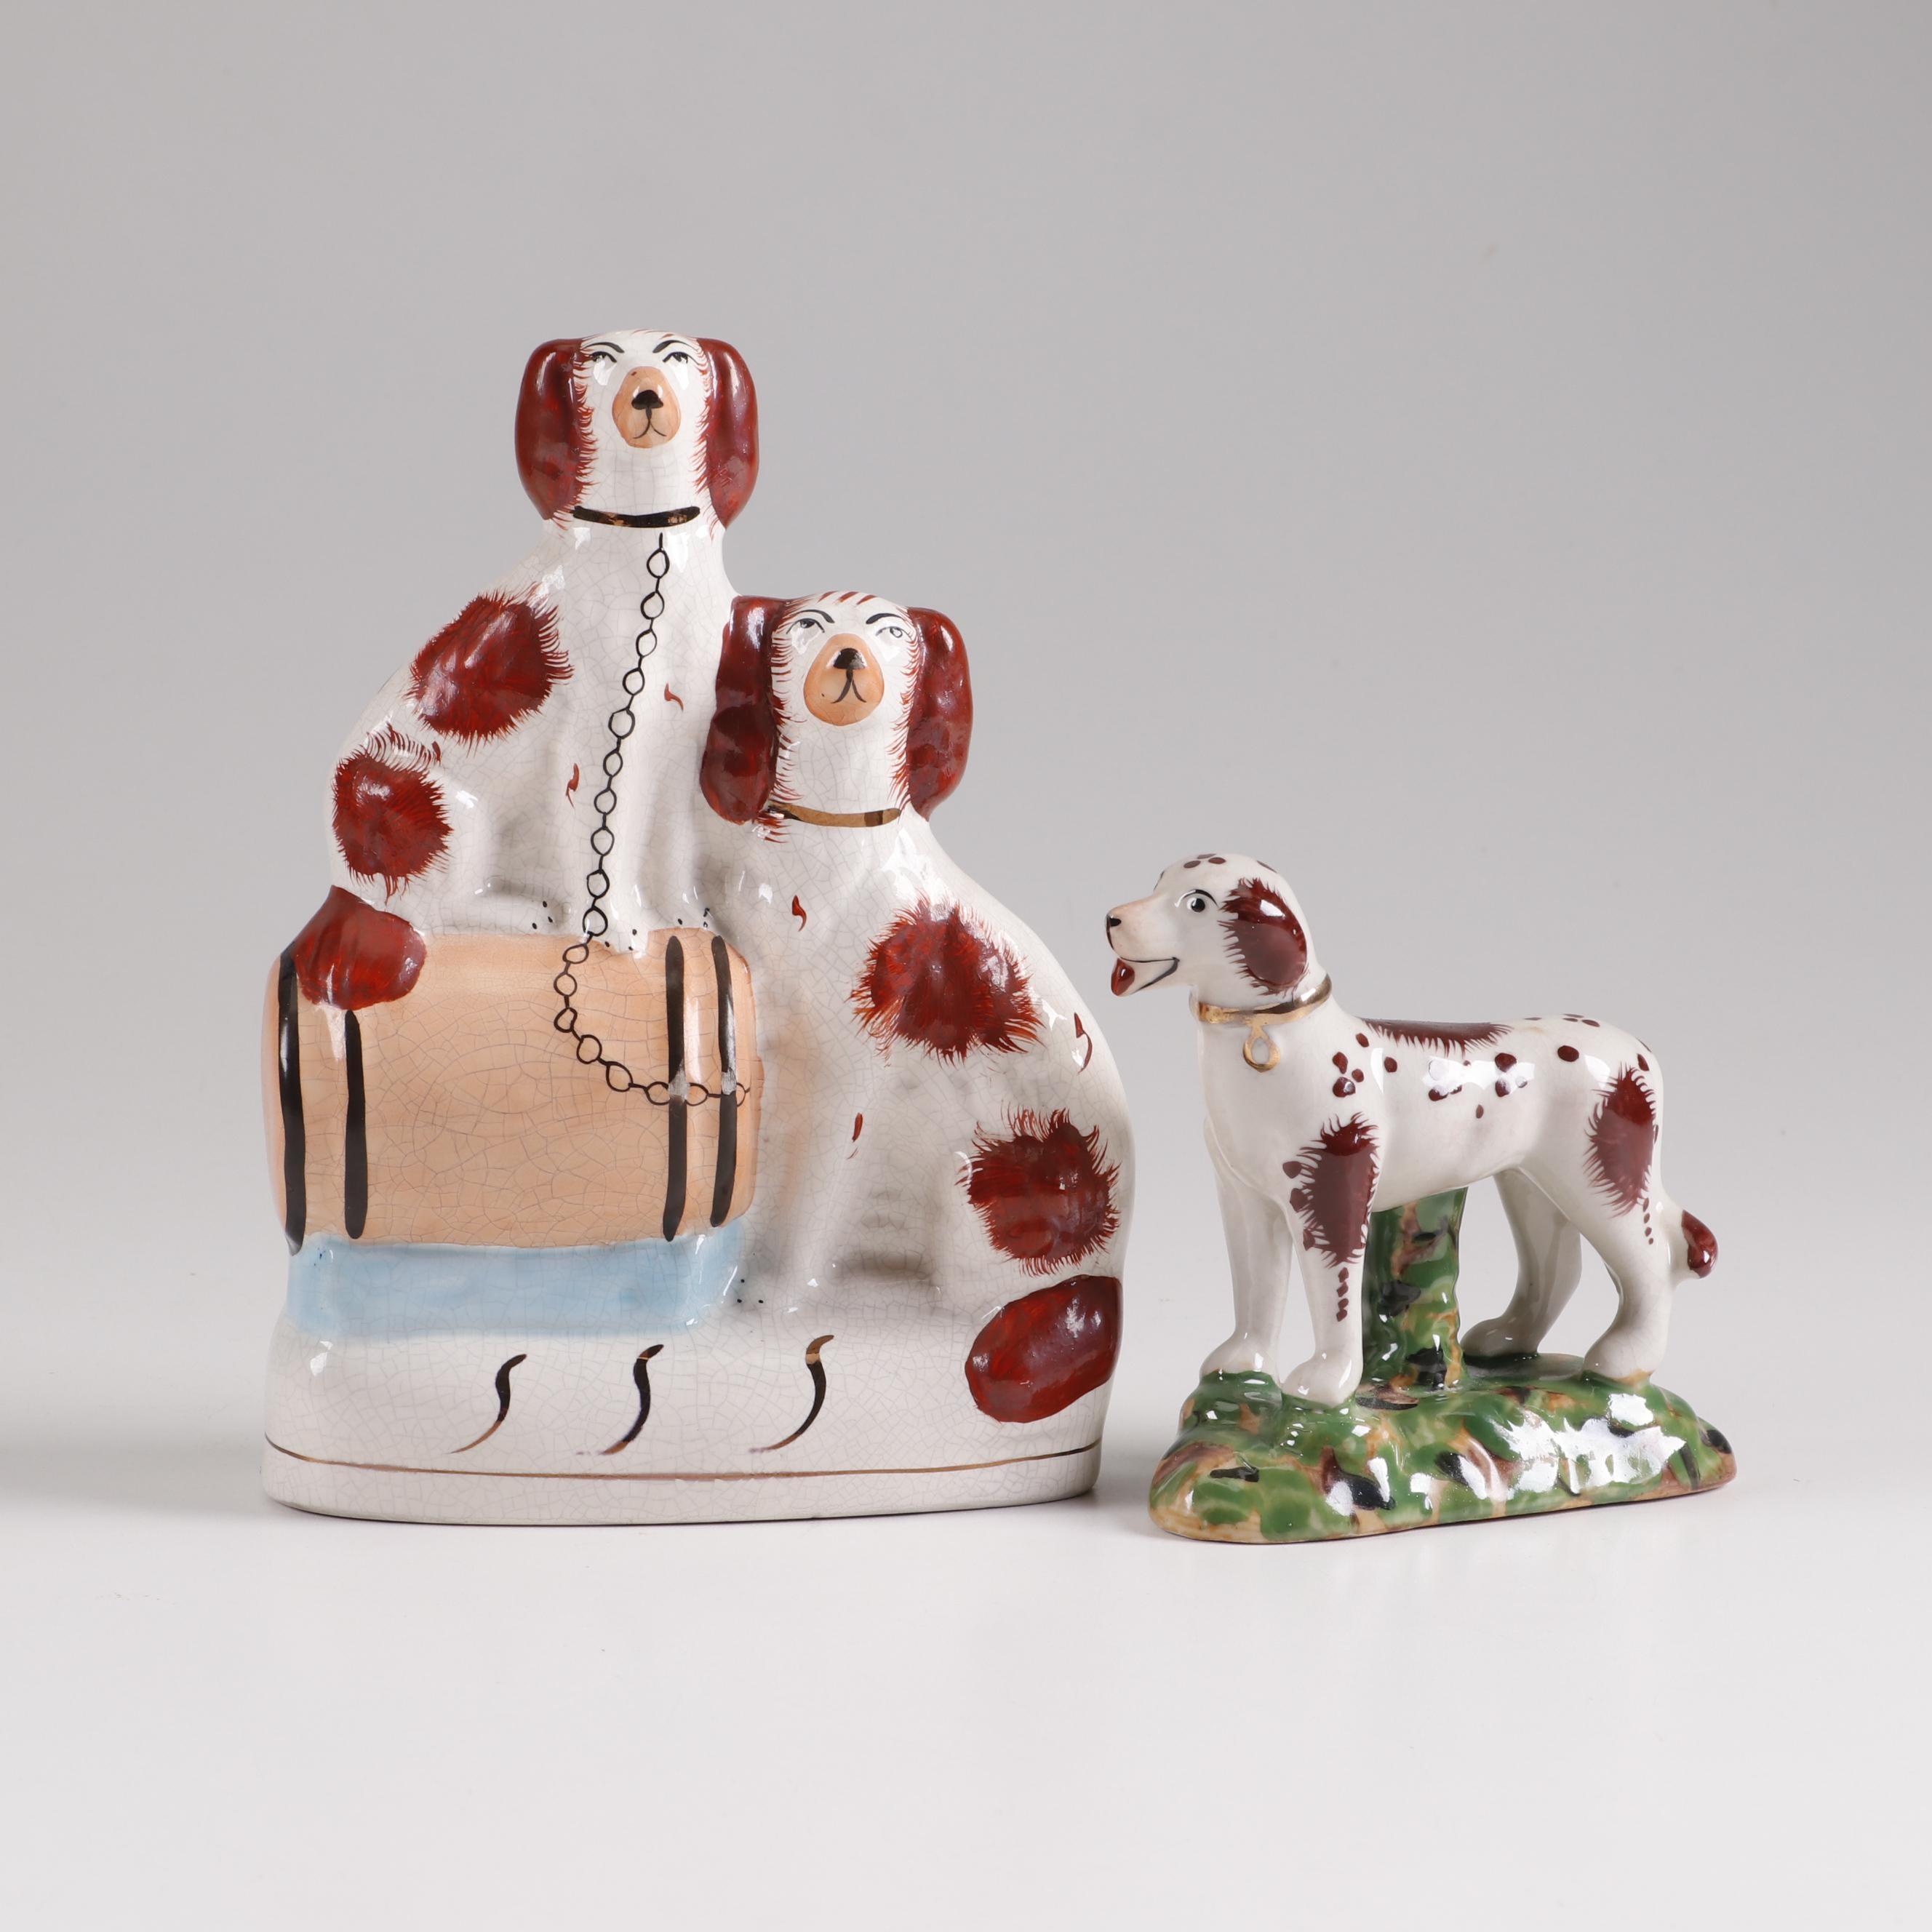 Staffordshire Style Porcelain Dog Figurines